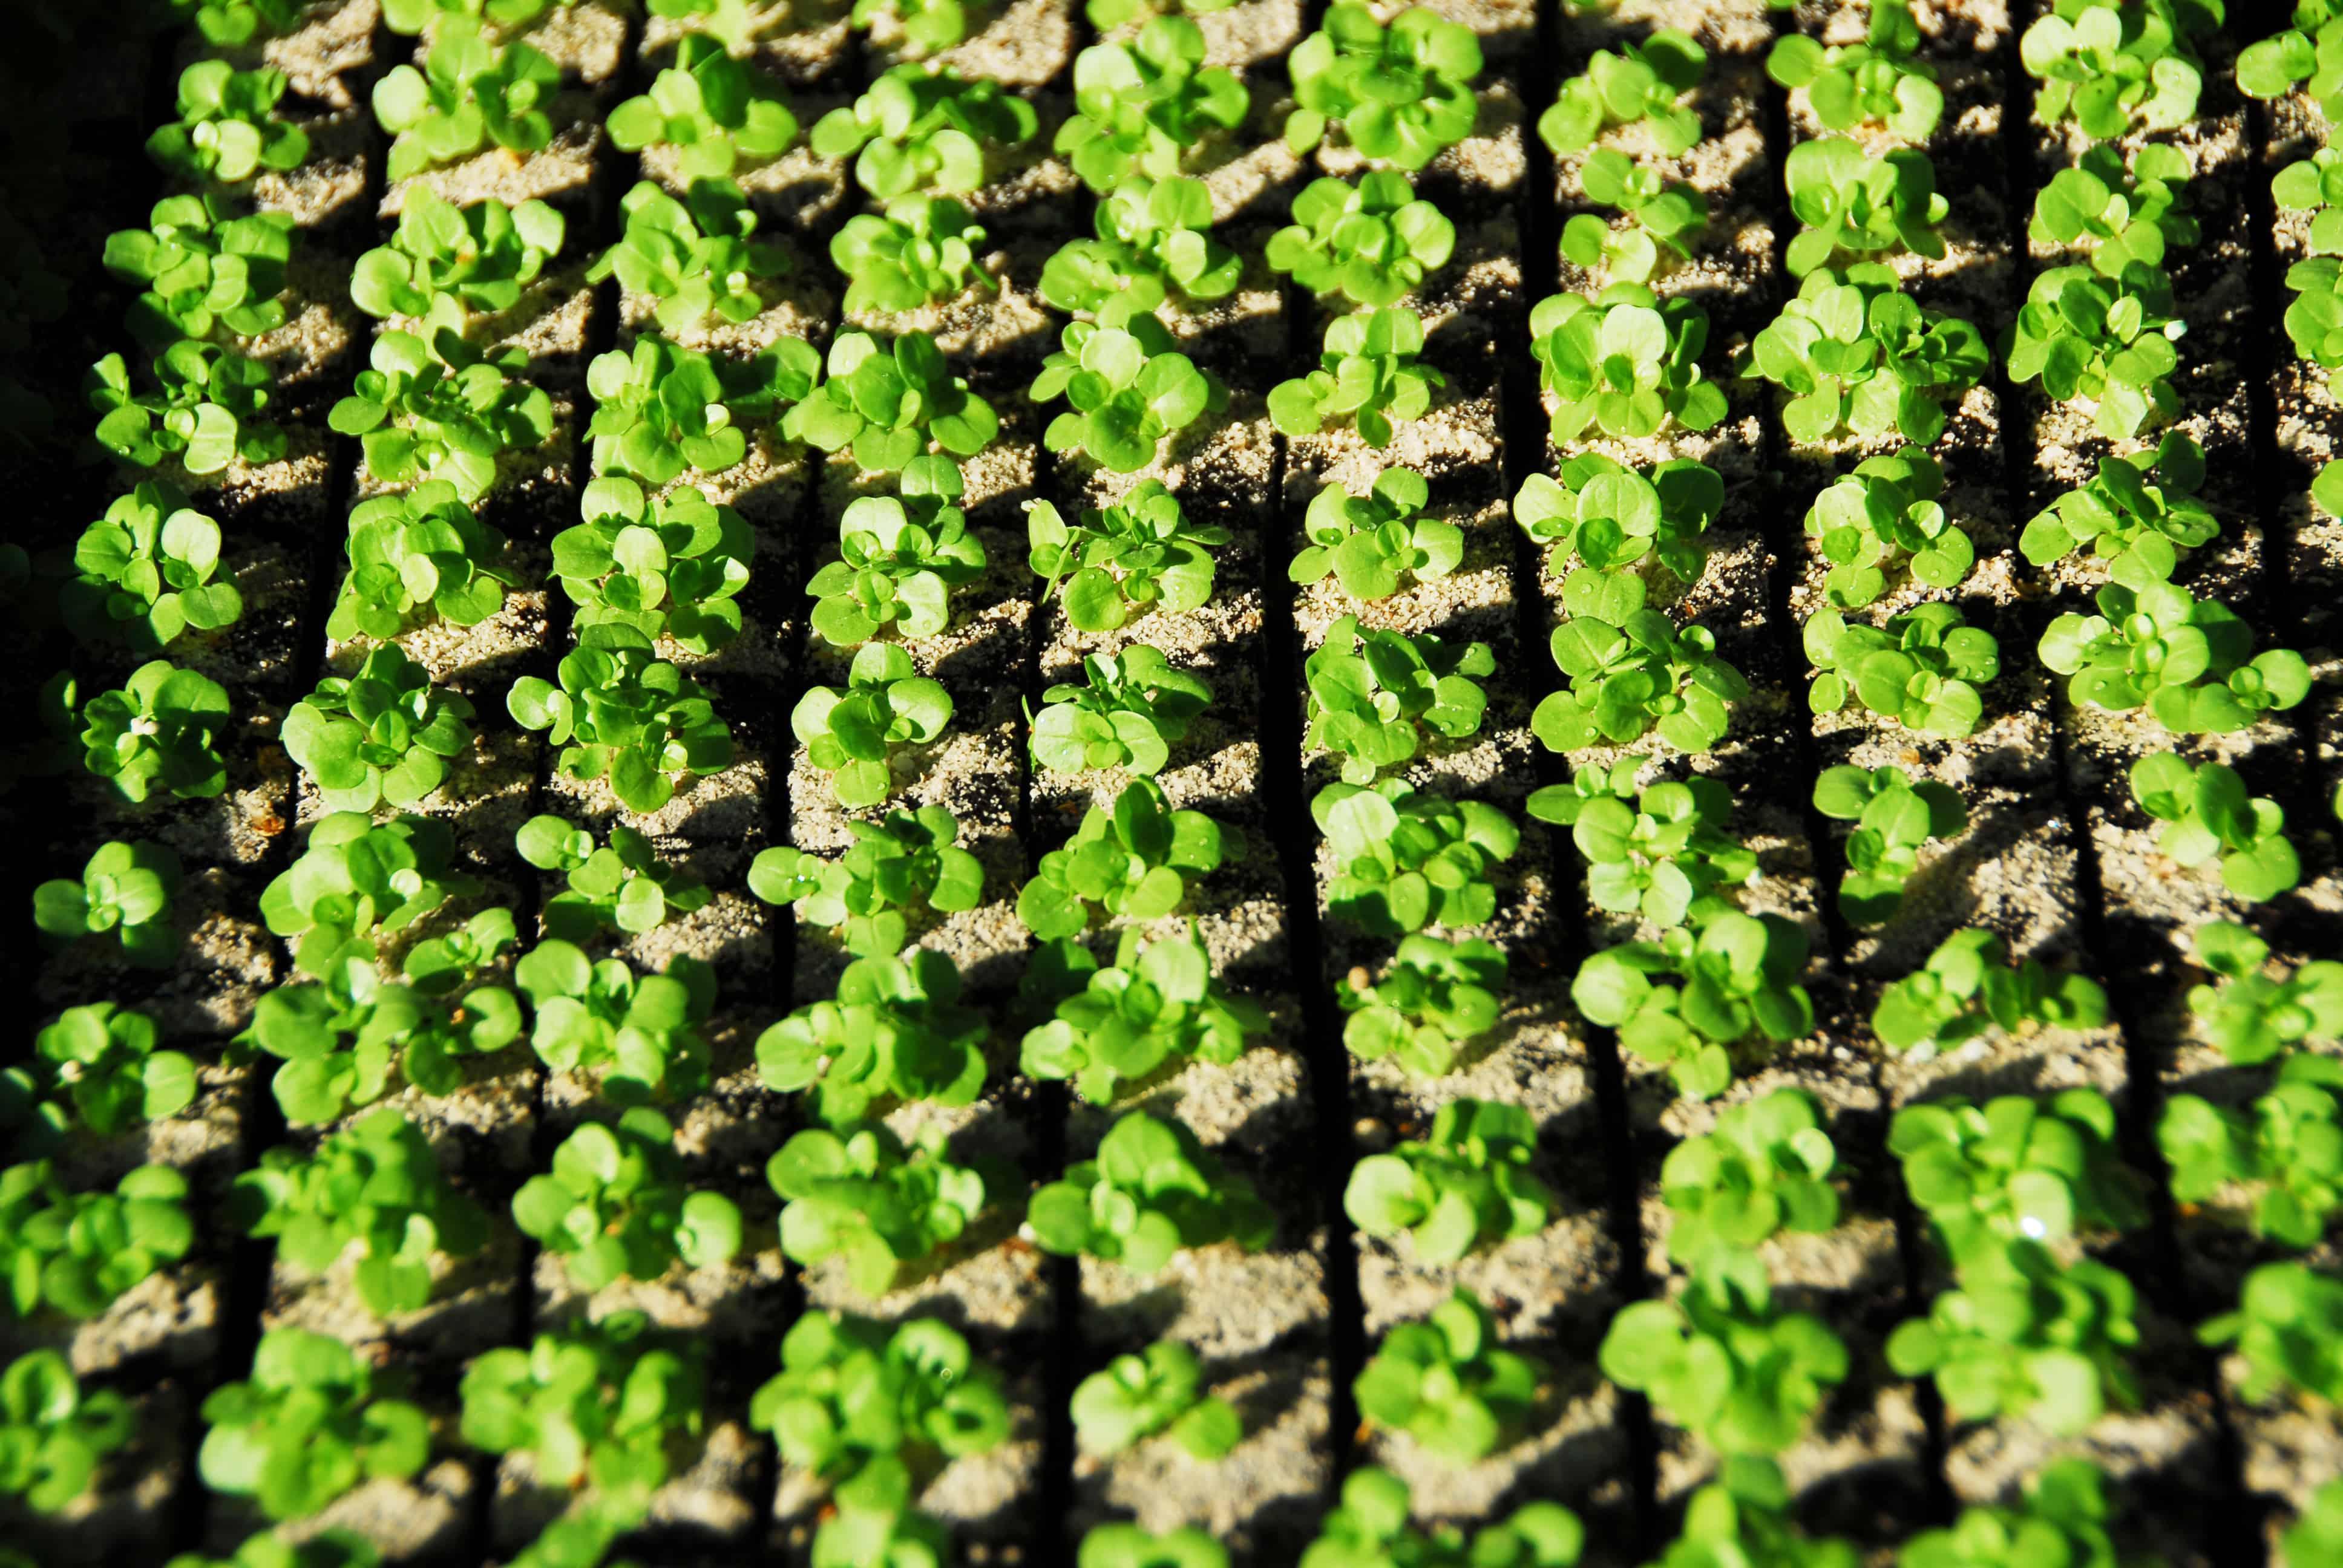 Salatsetzlinge in Reihen